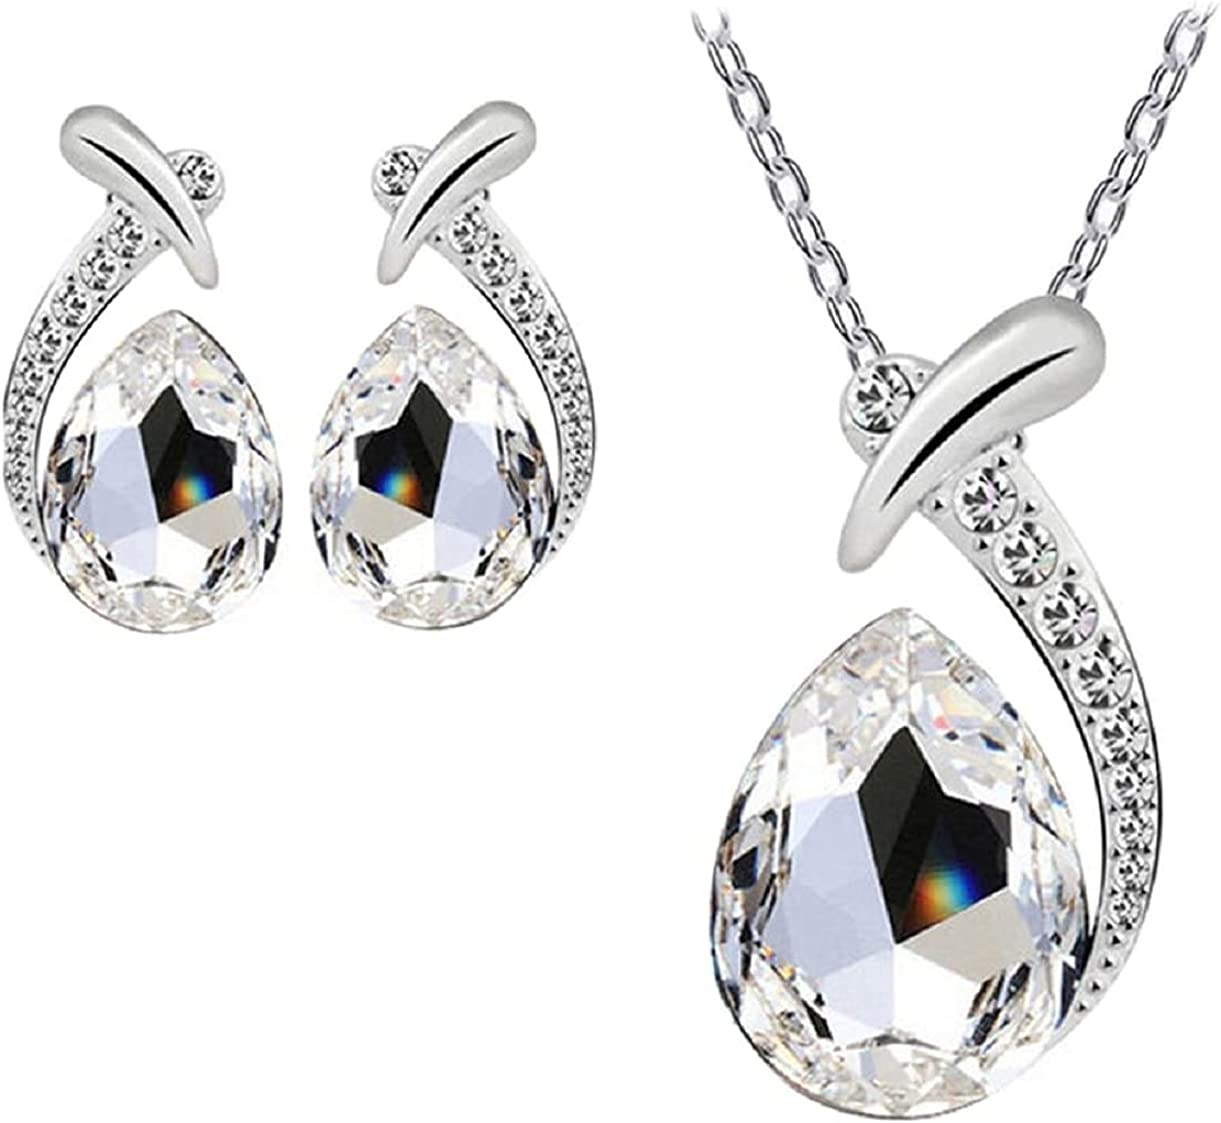 Harlorki Women Lady Girl Shiny Simple Crystal Rhinestone Pendent Chain Necklace Stud Earring Fashion Costume Jewelry Set